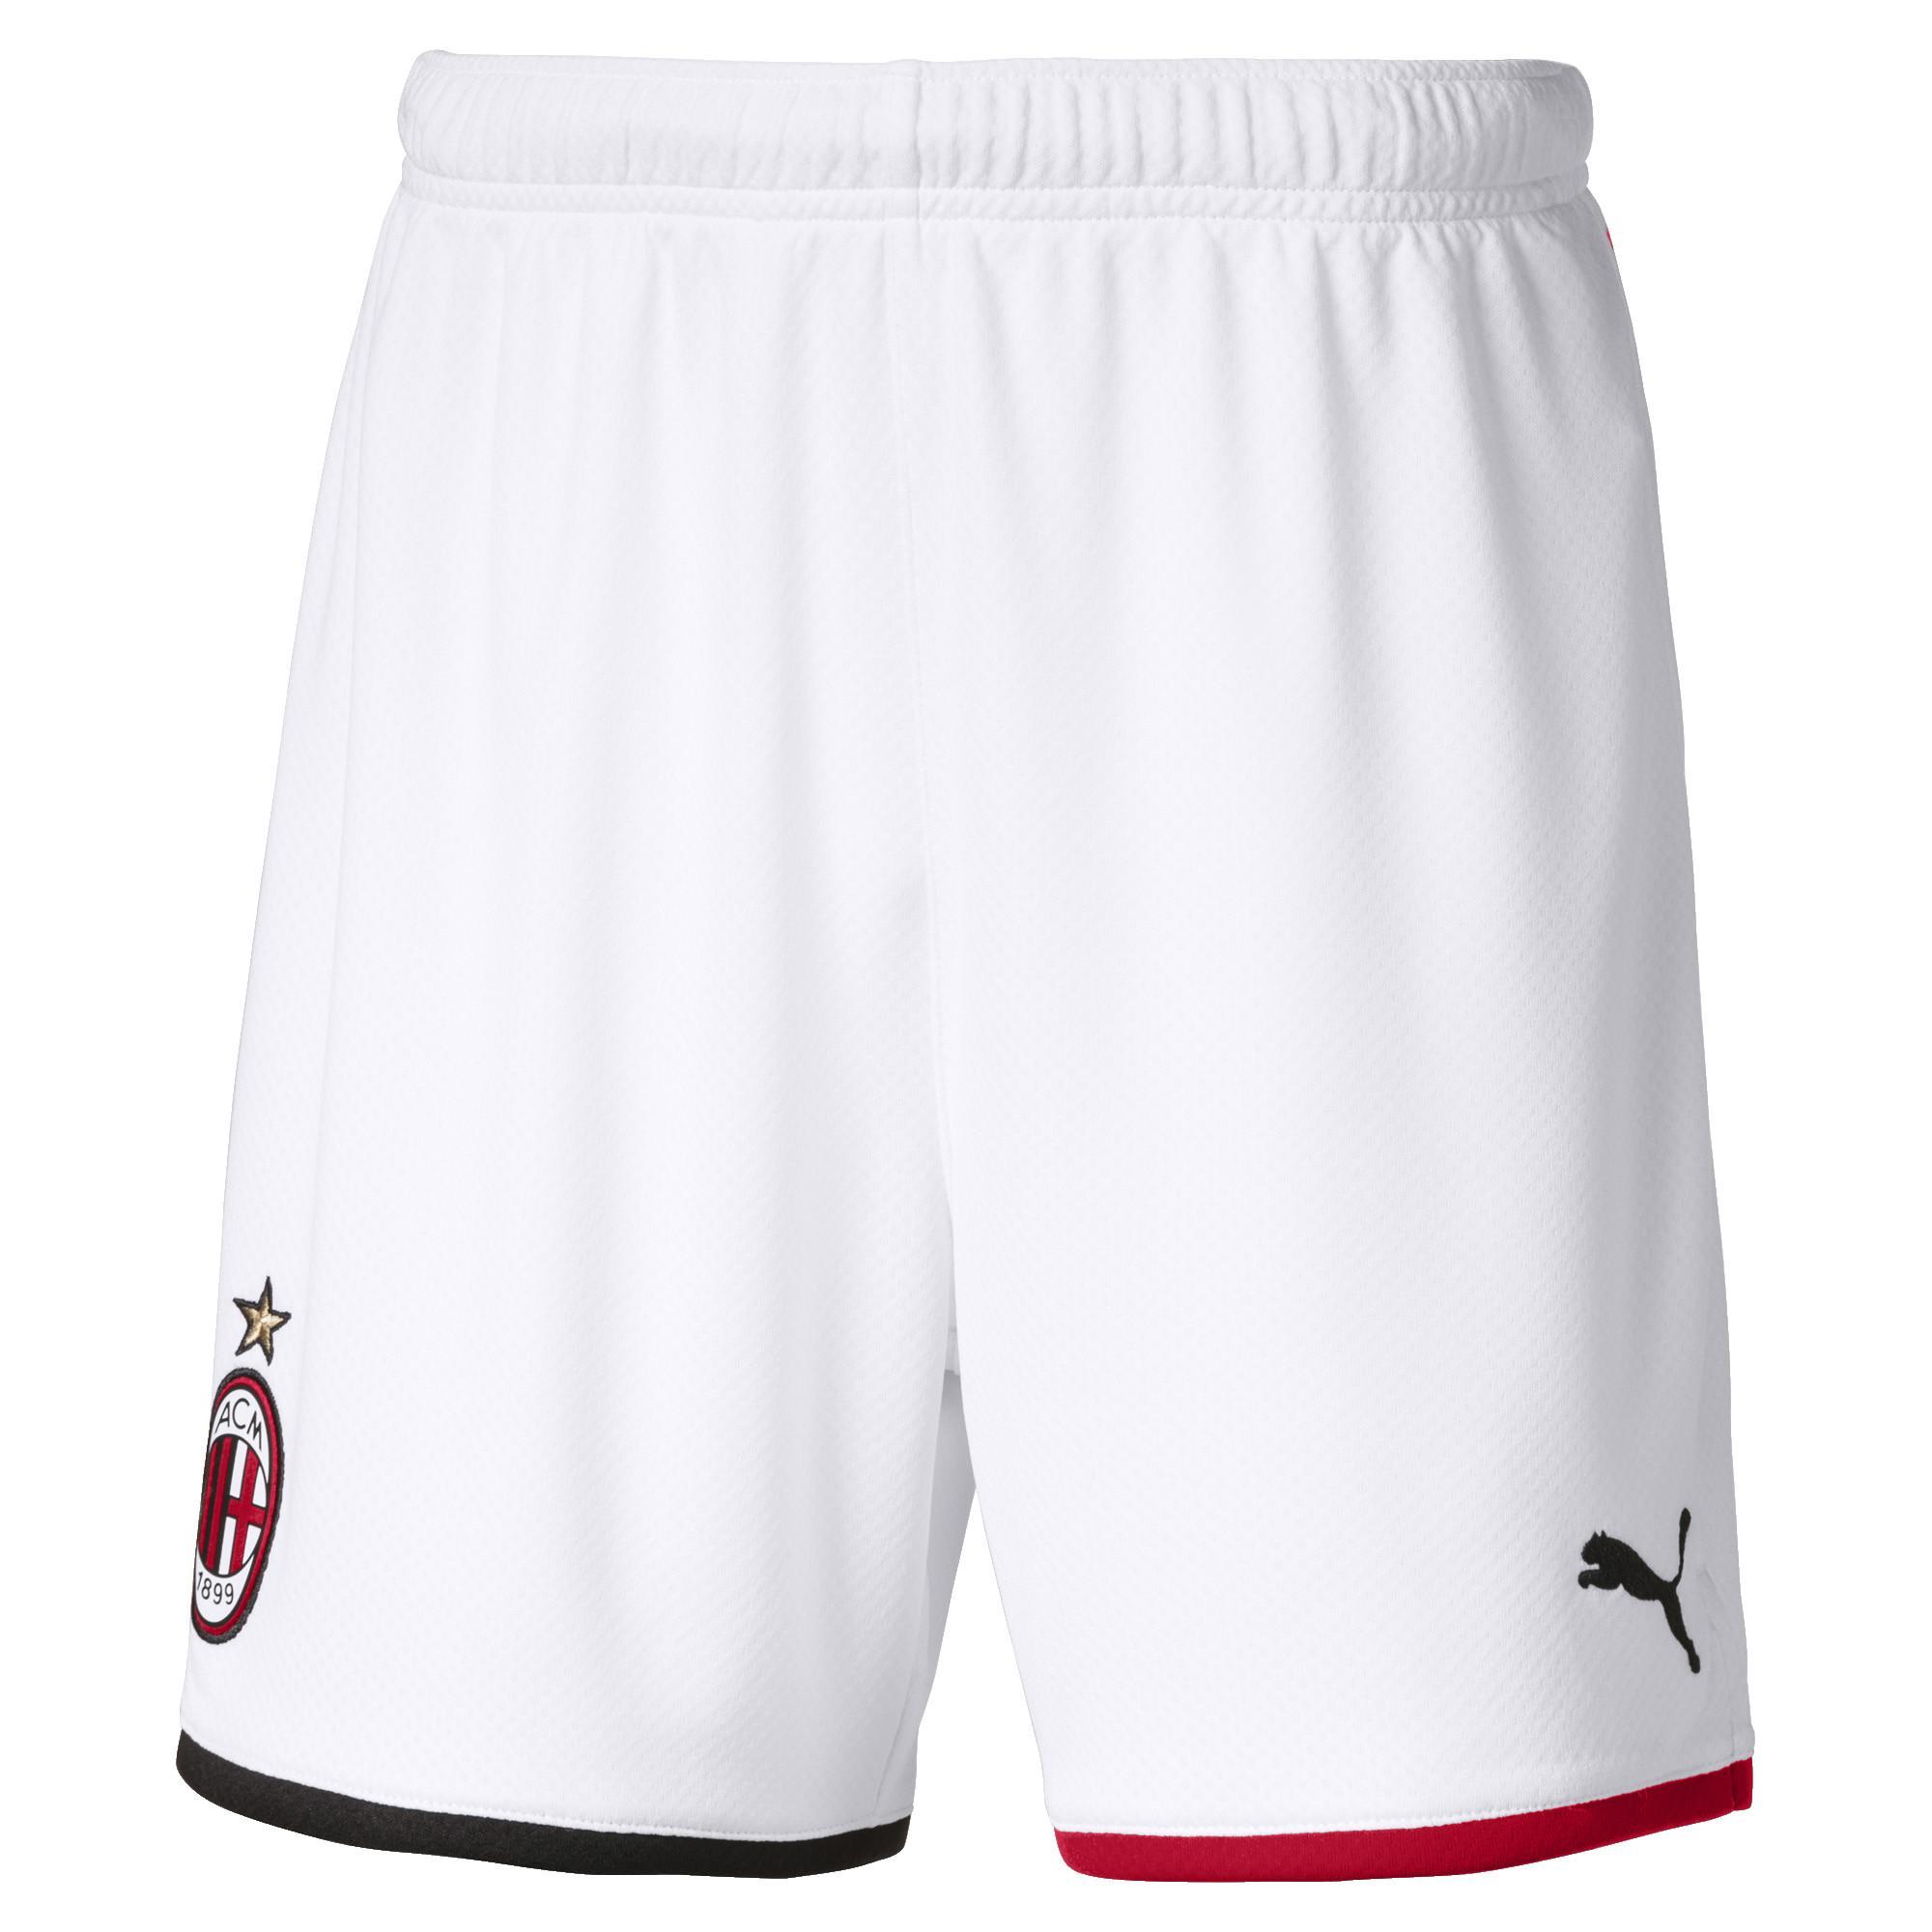 Puma Pantaloncini Gara Home & Away Milan Junior  19/20